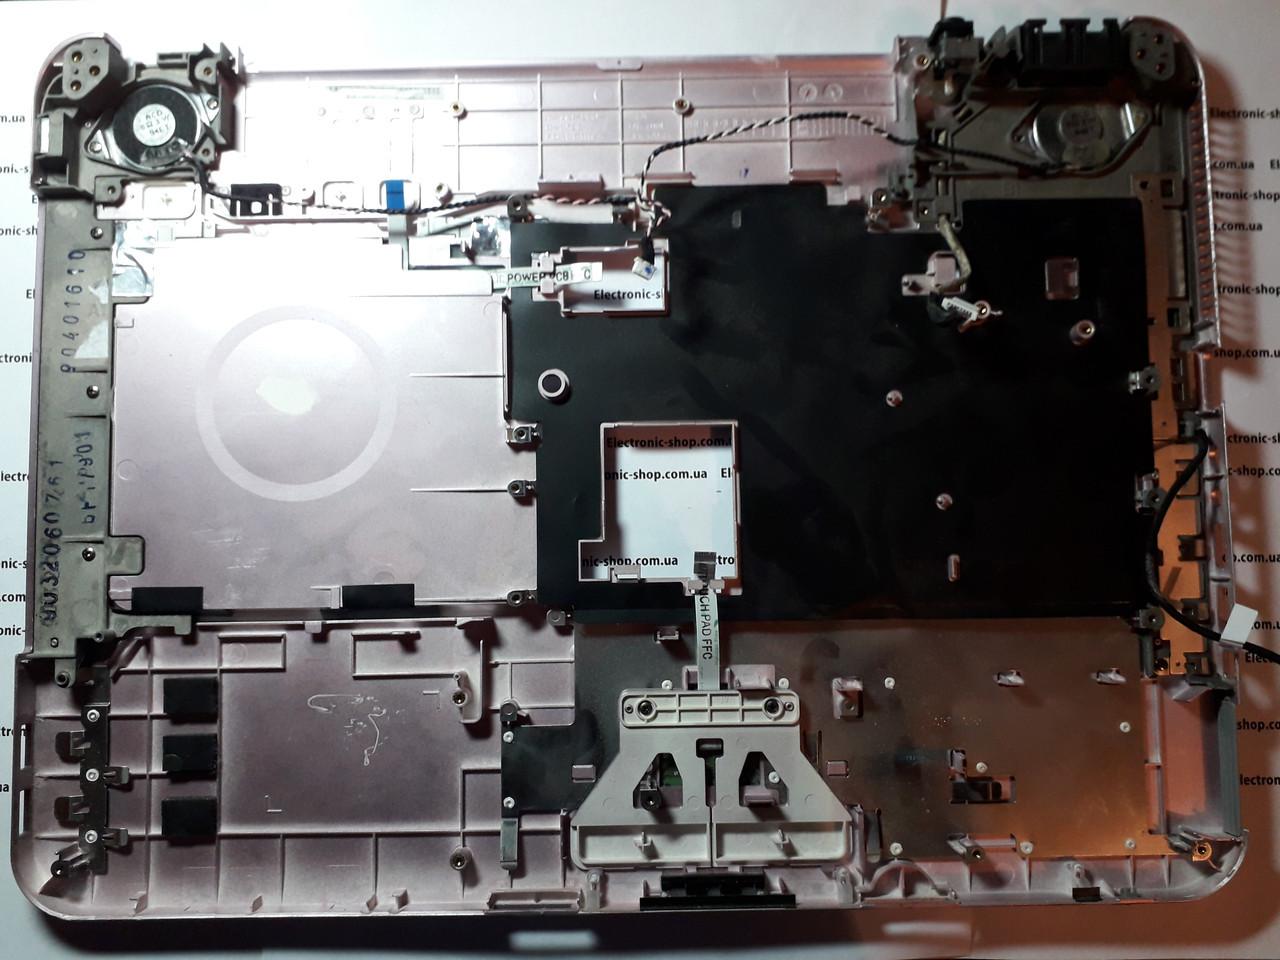 Корпус (тачпад) с колонками    Sony PCG -7154M  оригинал б.у.